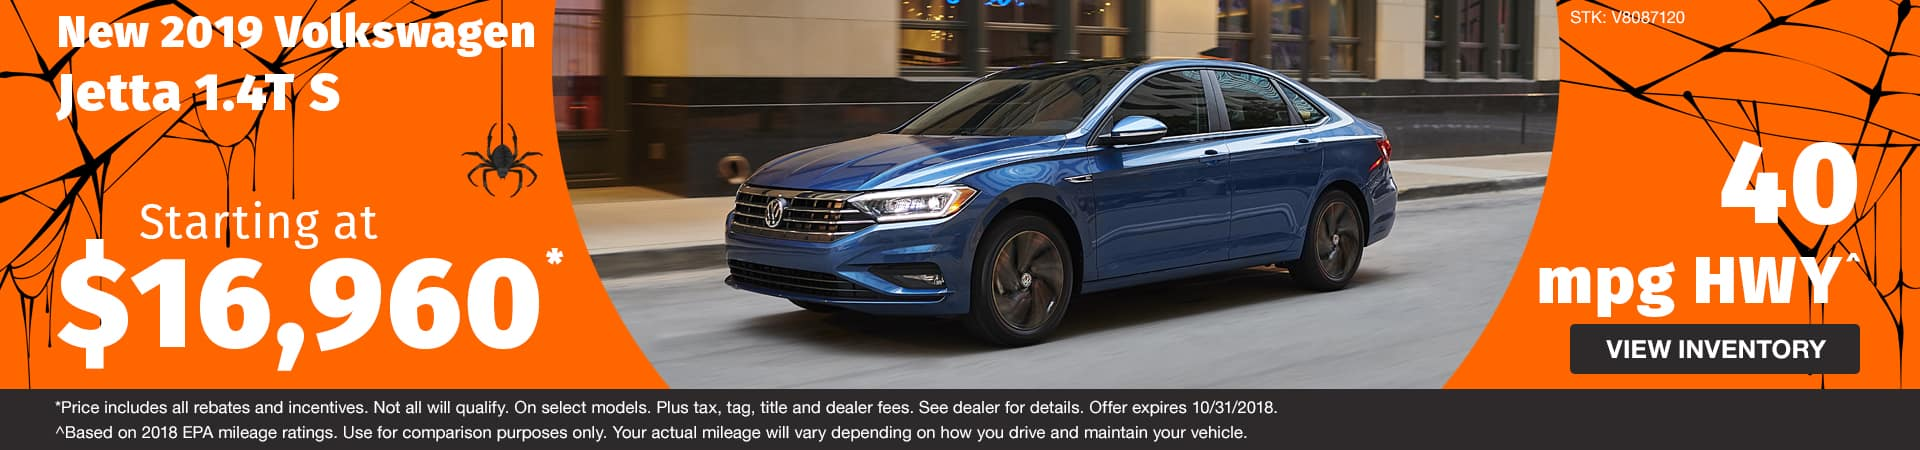 Drive home a new 2018 Volkswagen Jetta starting at just $16,690 in Murfreesboro TN